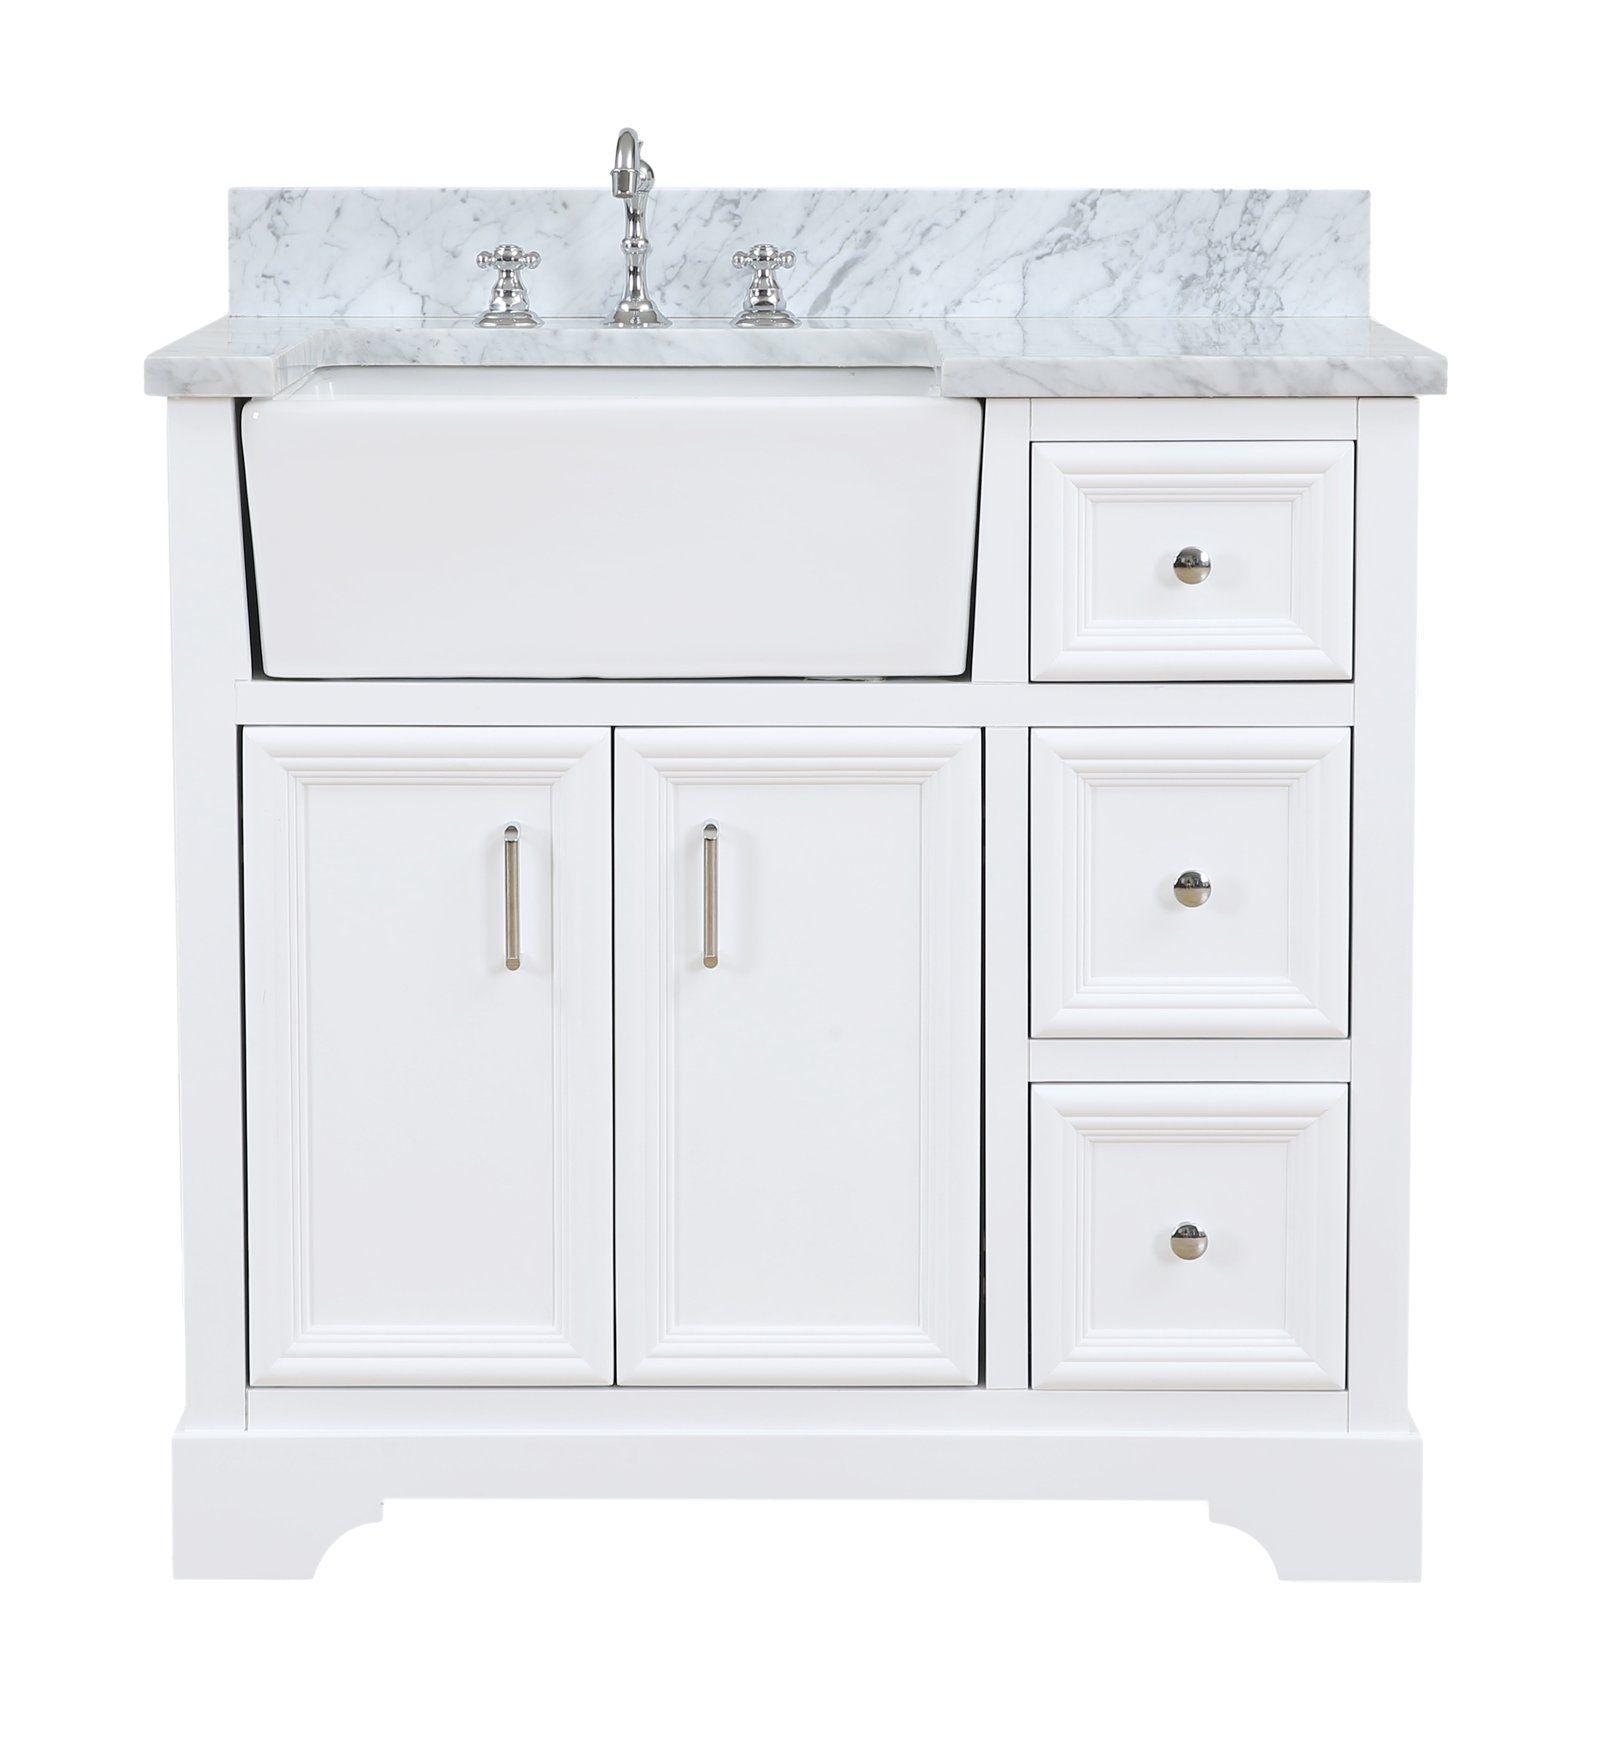 Zelda 36inch Farmhouse Vanity with Carrara Marble Top in